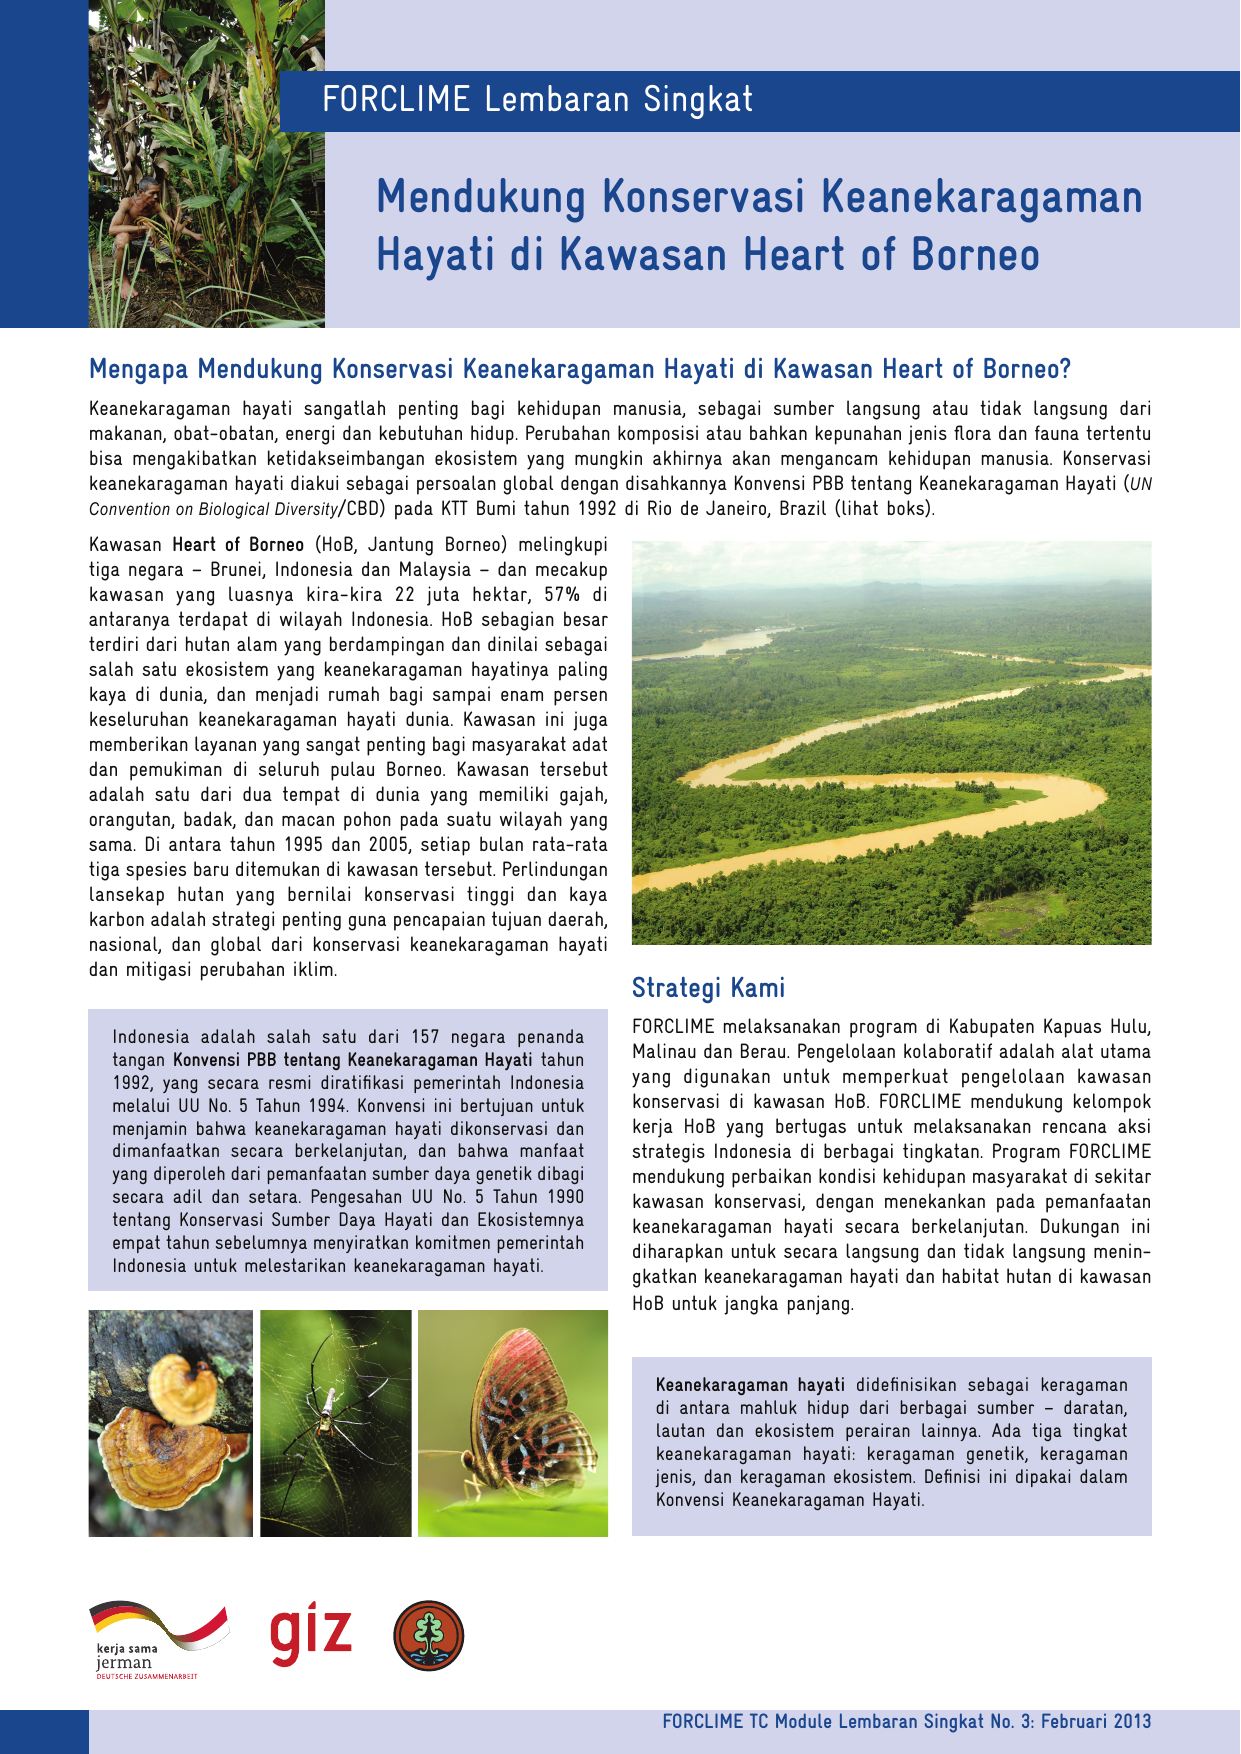 MAPALIPMA (Tracking-Observation-Conservation): STRATEGI KONSERVASI